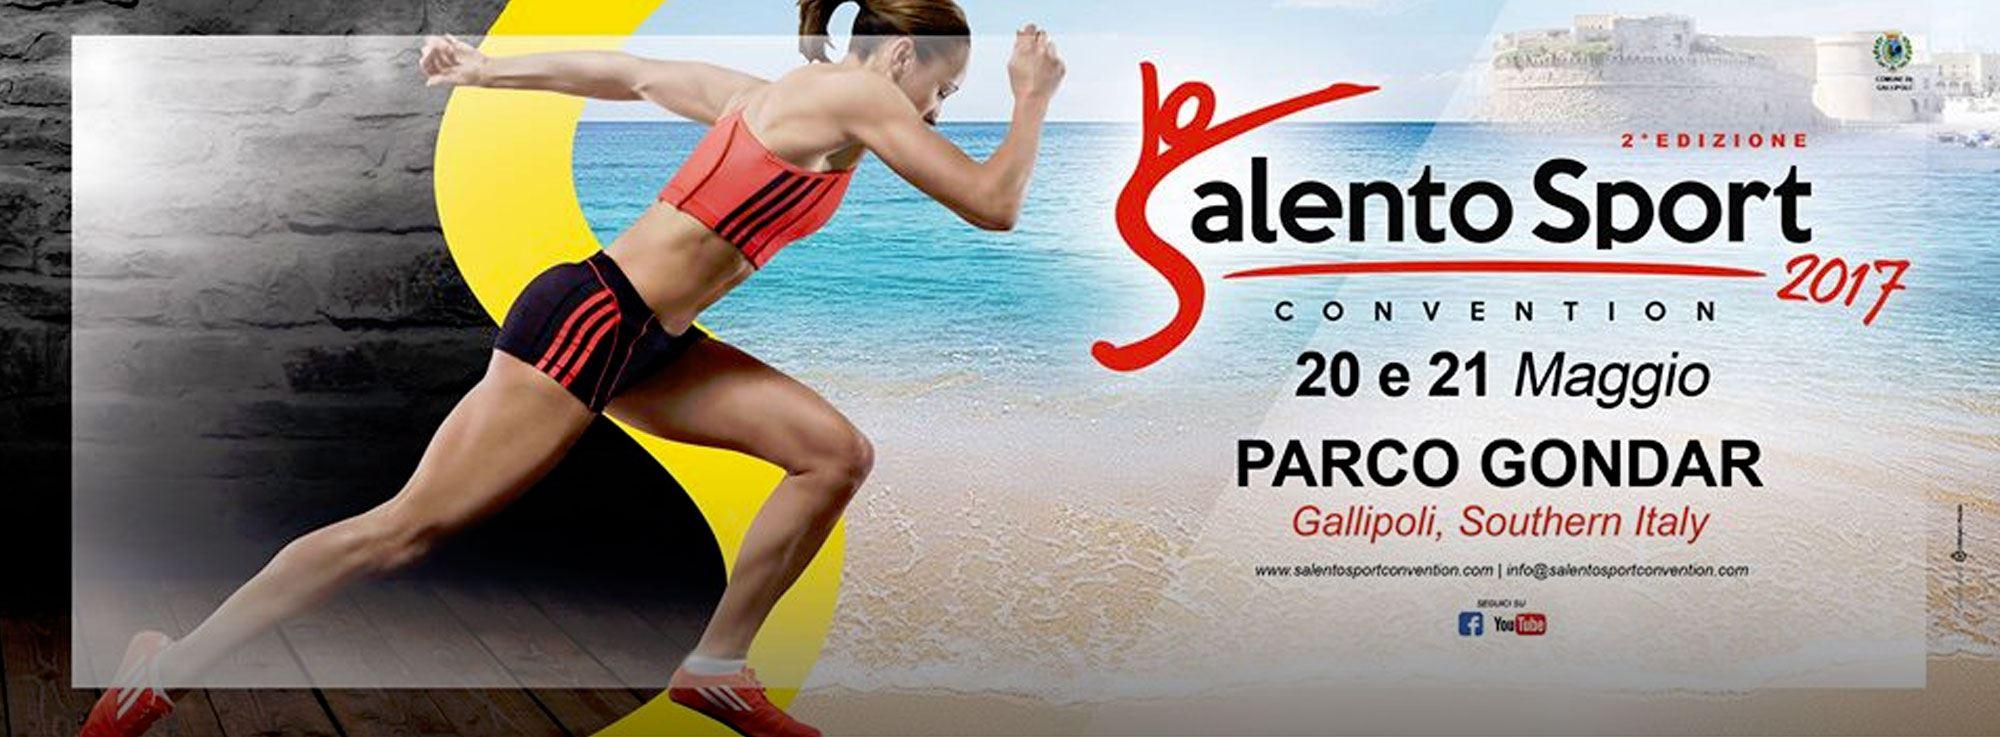 Gallipoli: Salento Sport Convention